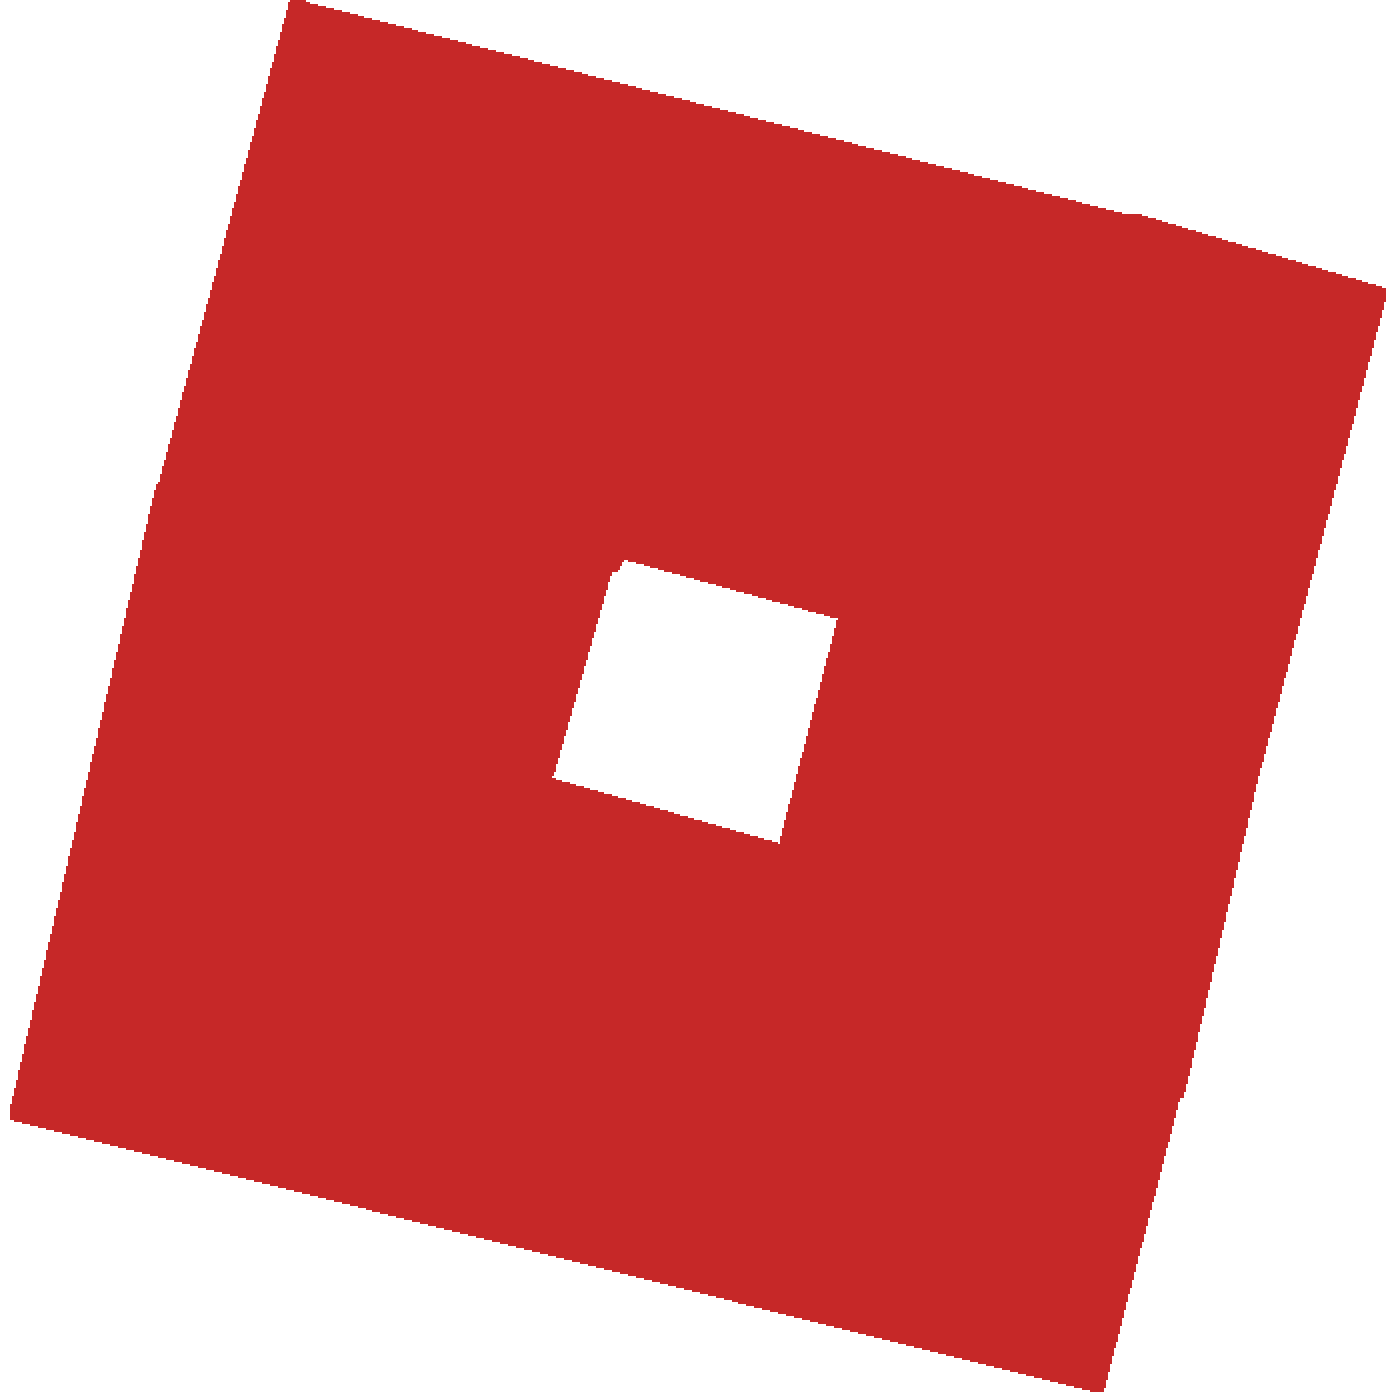 Pixilart - Roblox icon by SoccerGamerGirl